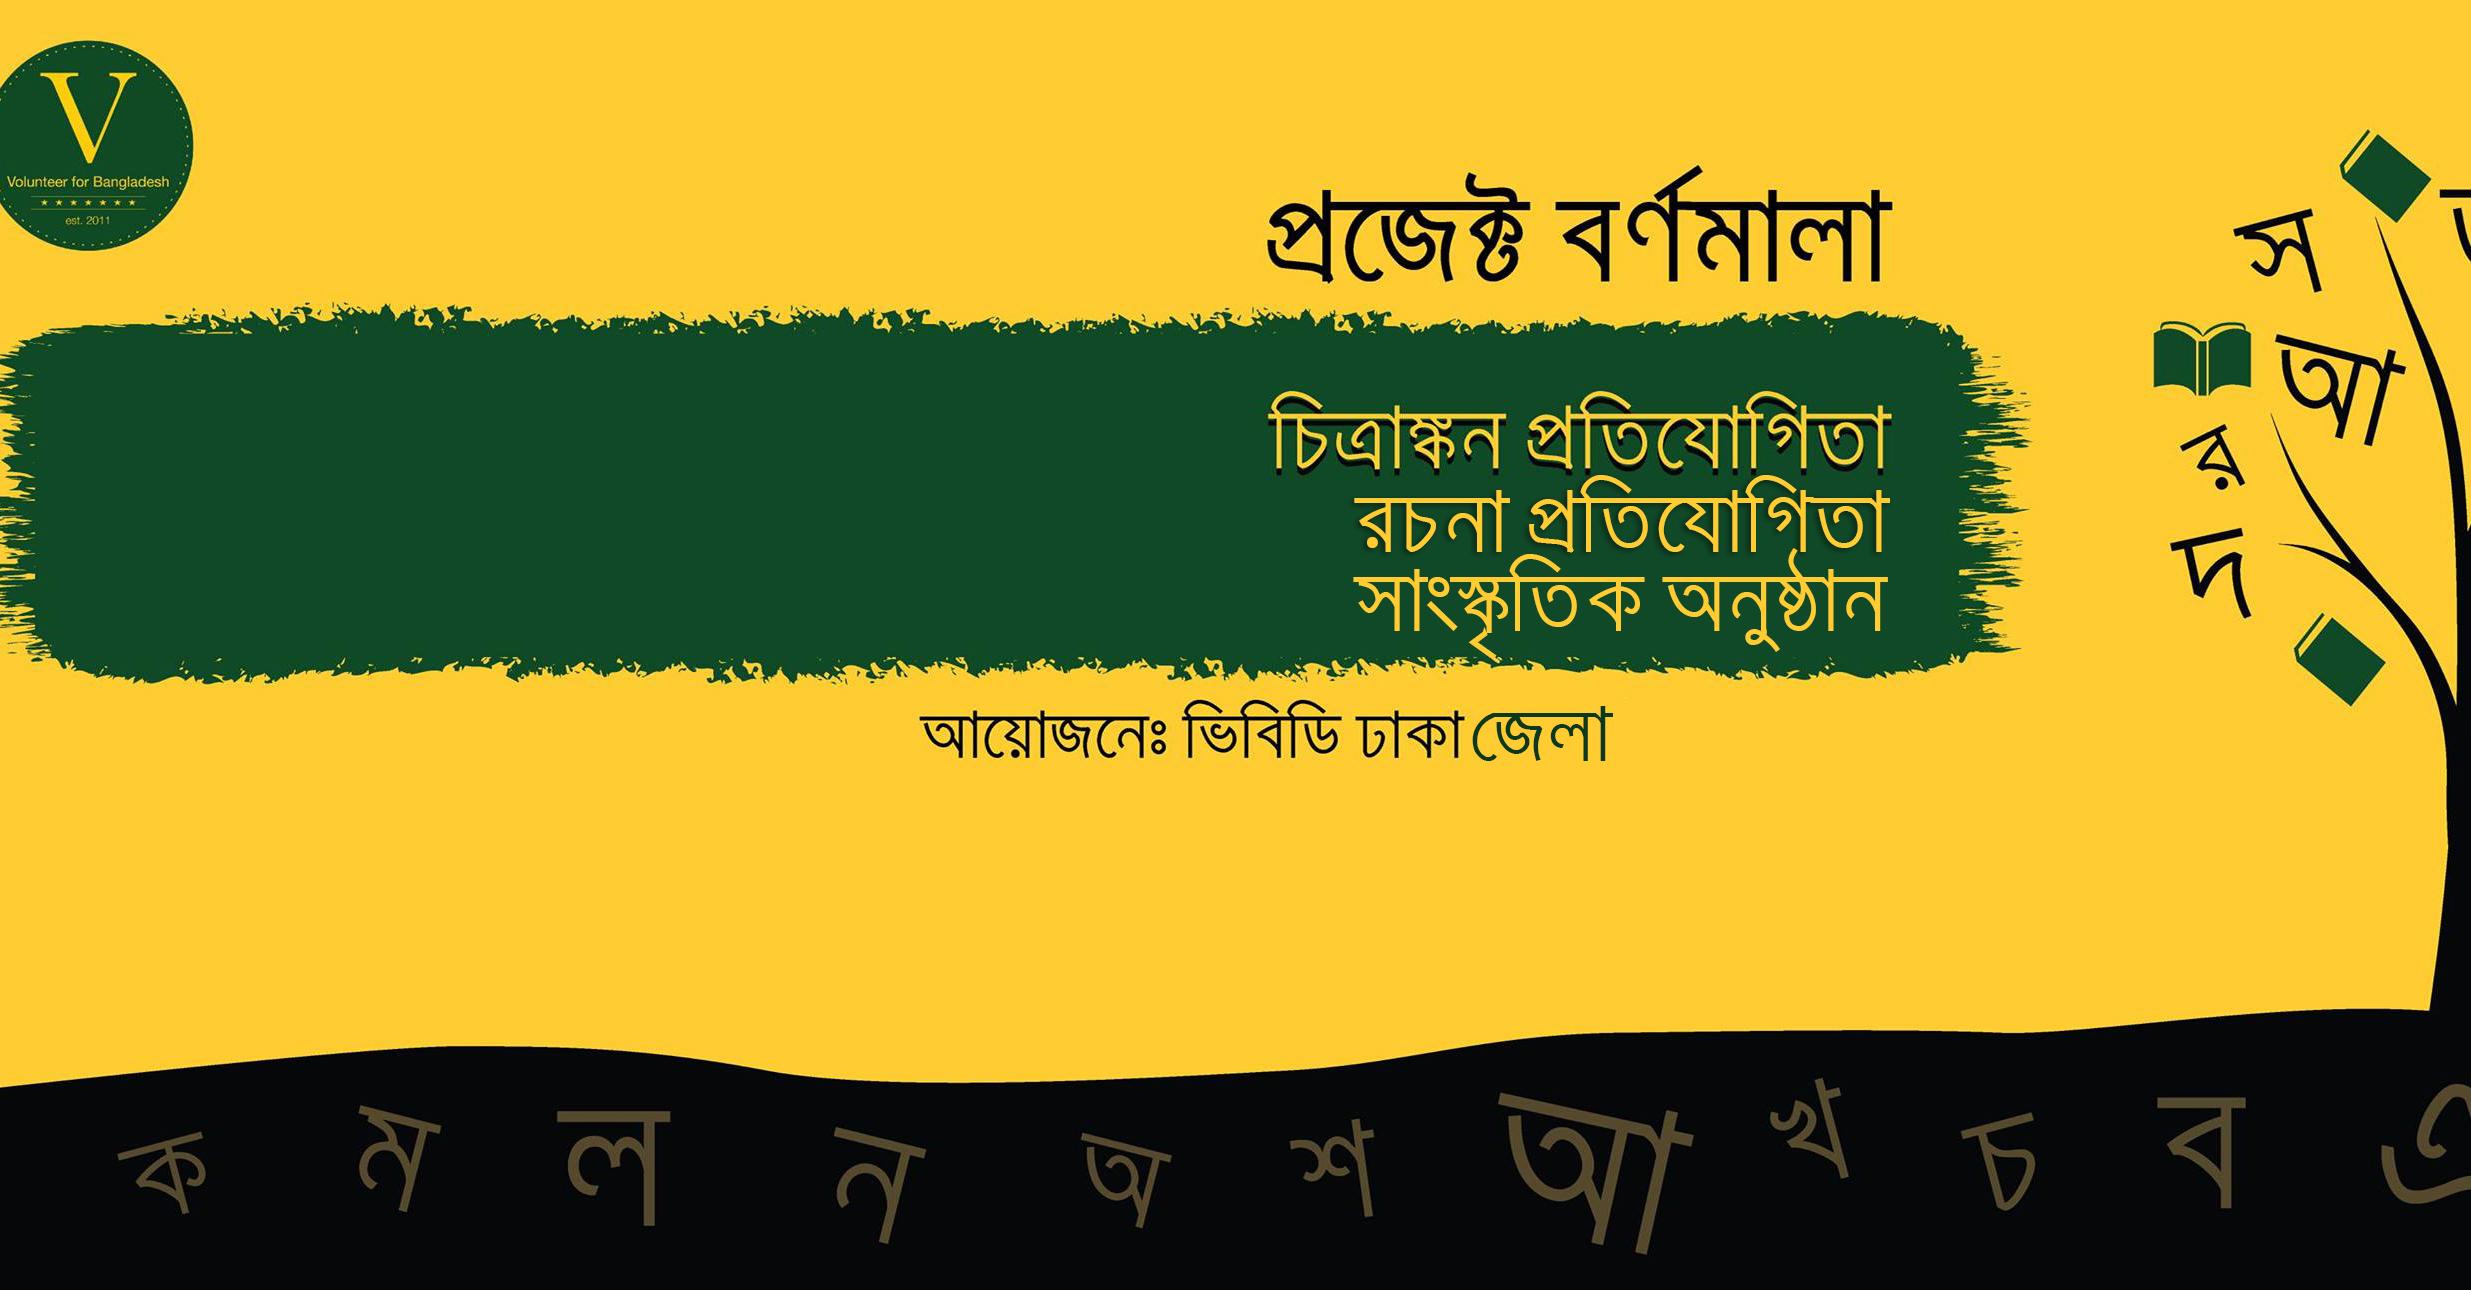 Project Bornomala 2017 in Dhaka - Bangladesh